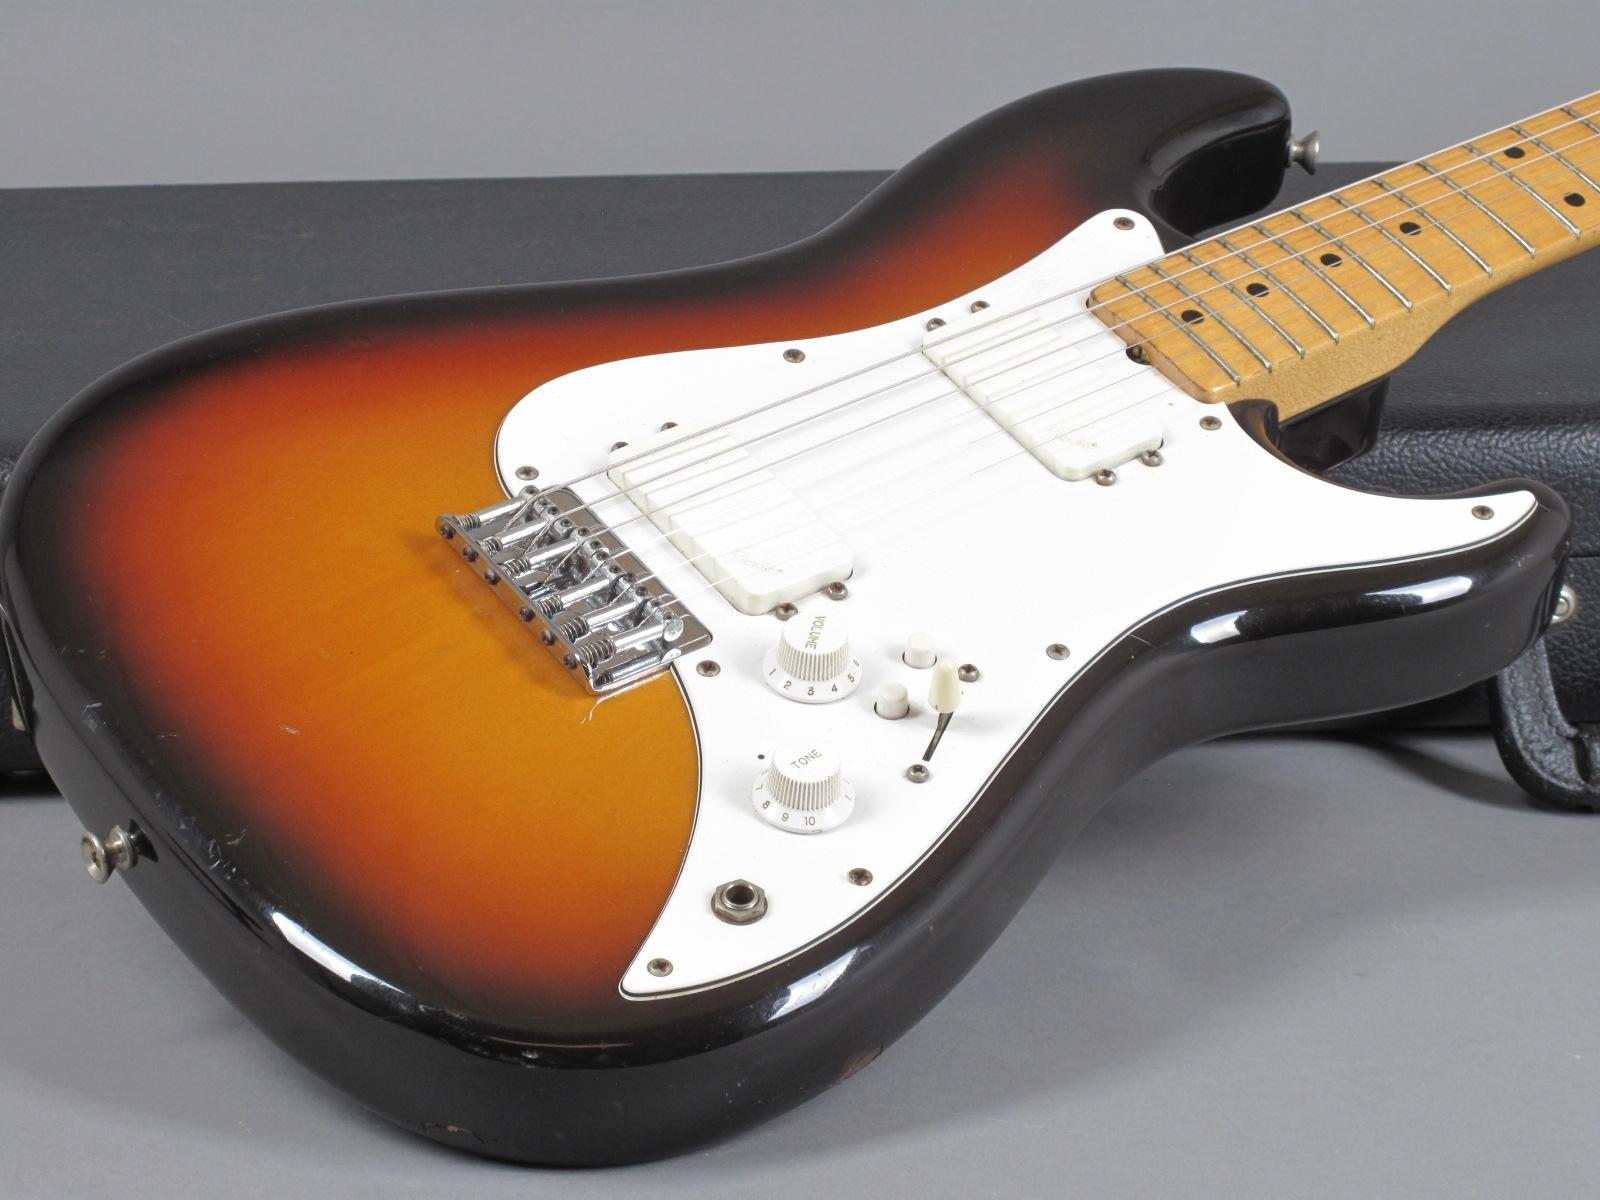 https://guitarpoint.de/app/uploads/products/1984-fender-squier-bullet-h2-sunburst/1984-Squier-Bullet-I-Sunburst-SQ29026-14.jpg